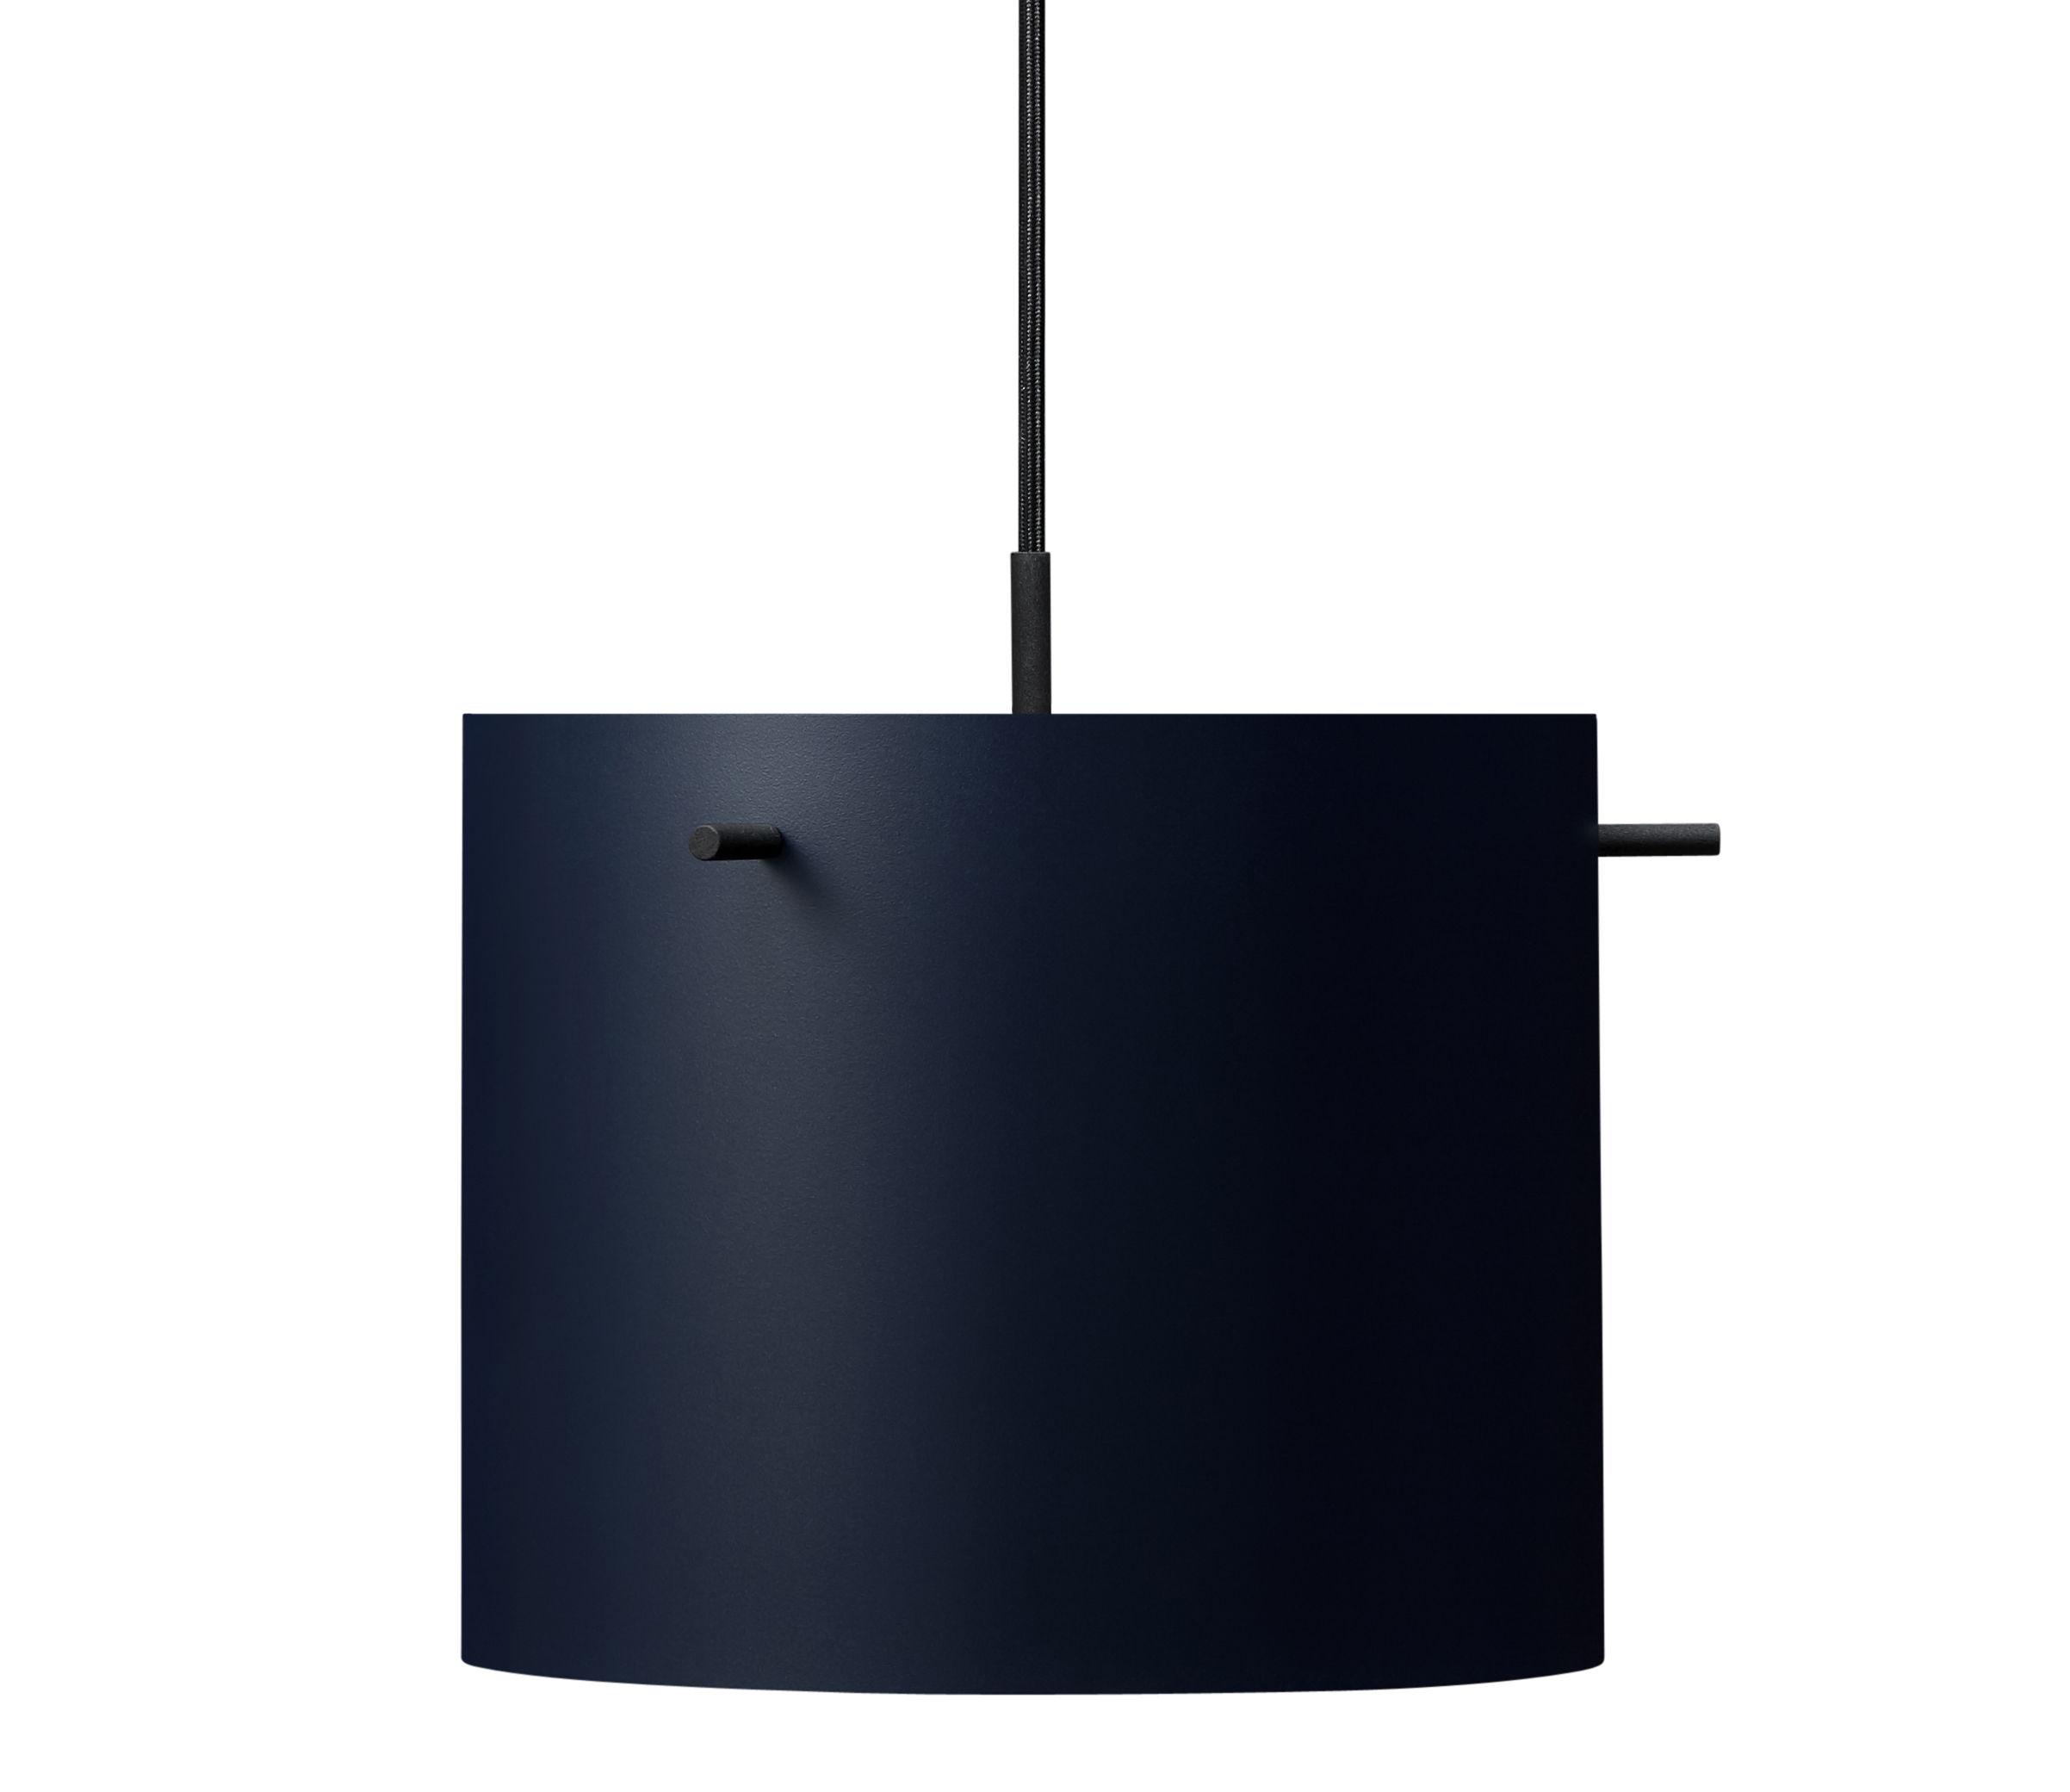 Luminaire - Suspensions - Suspension FM 1954 / Medium - Ø 28 x H 23 cm - Rewired - Bleu - Acier laqué époxy